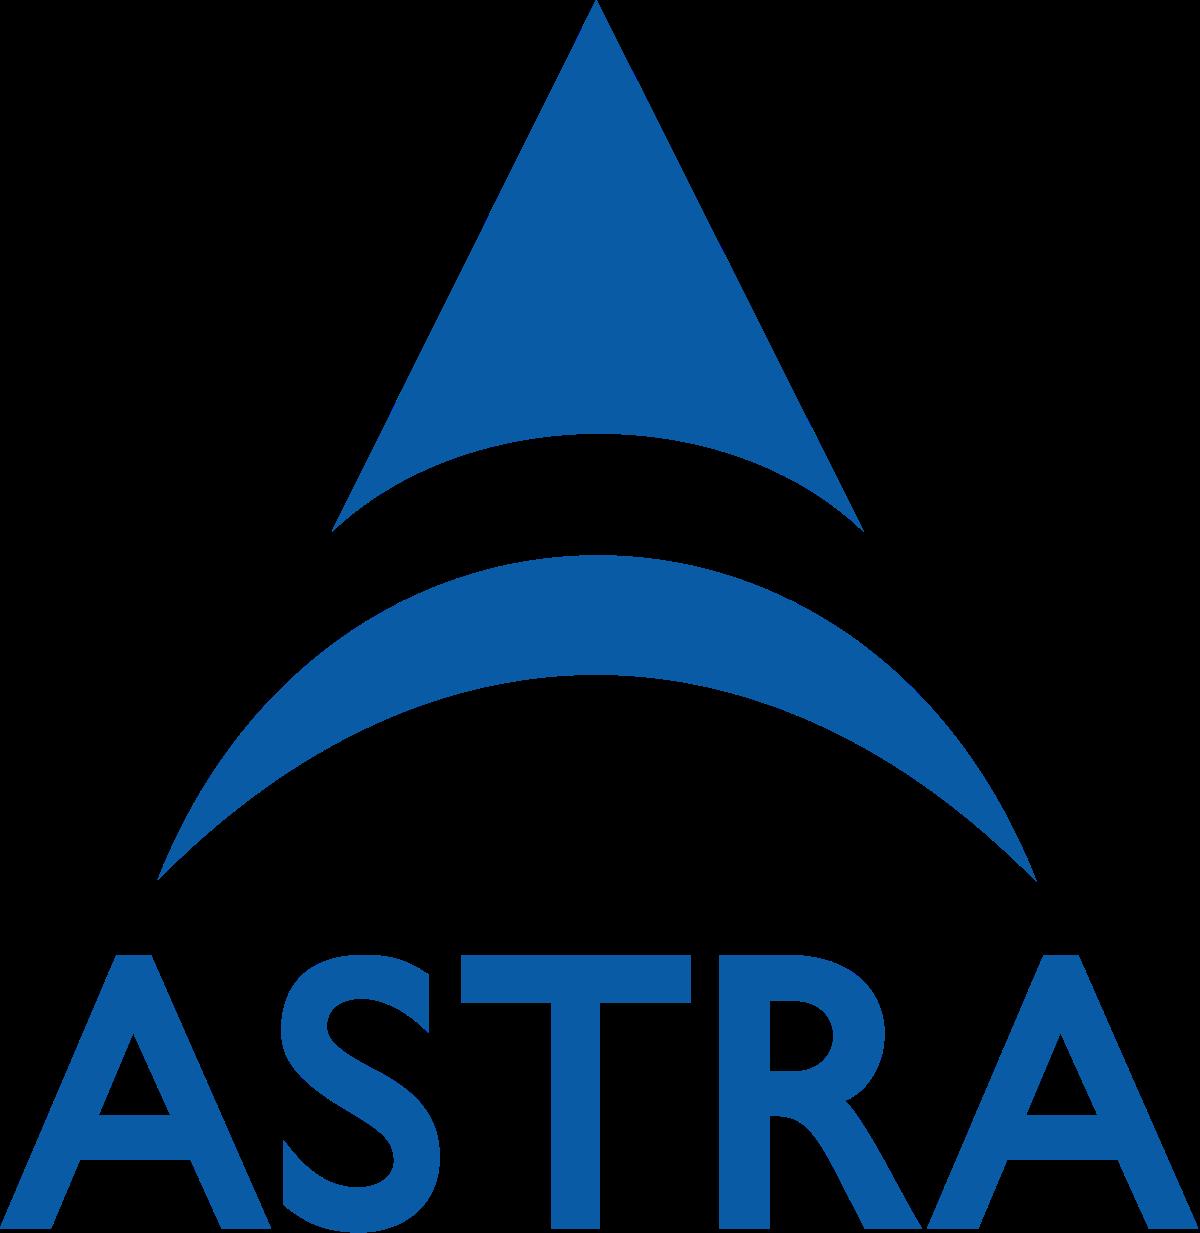 astra satelite